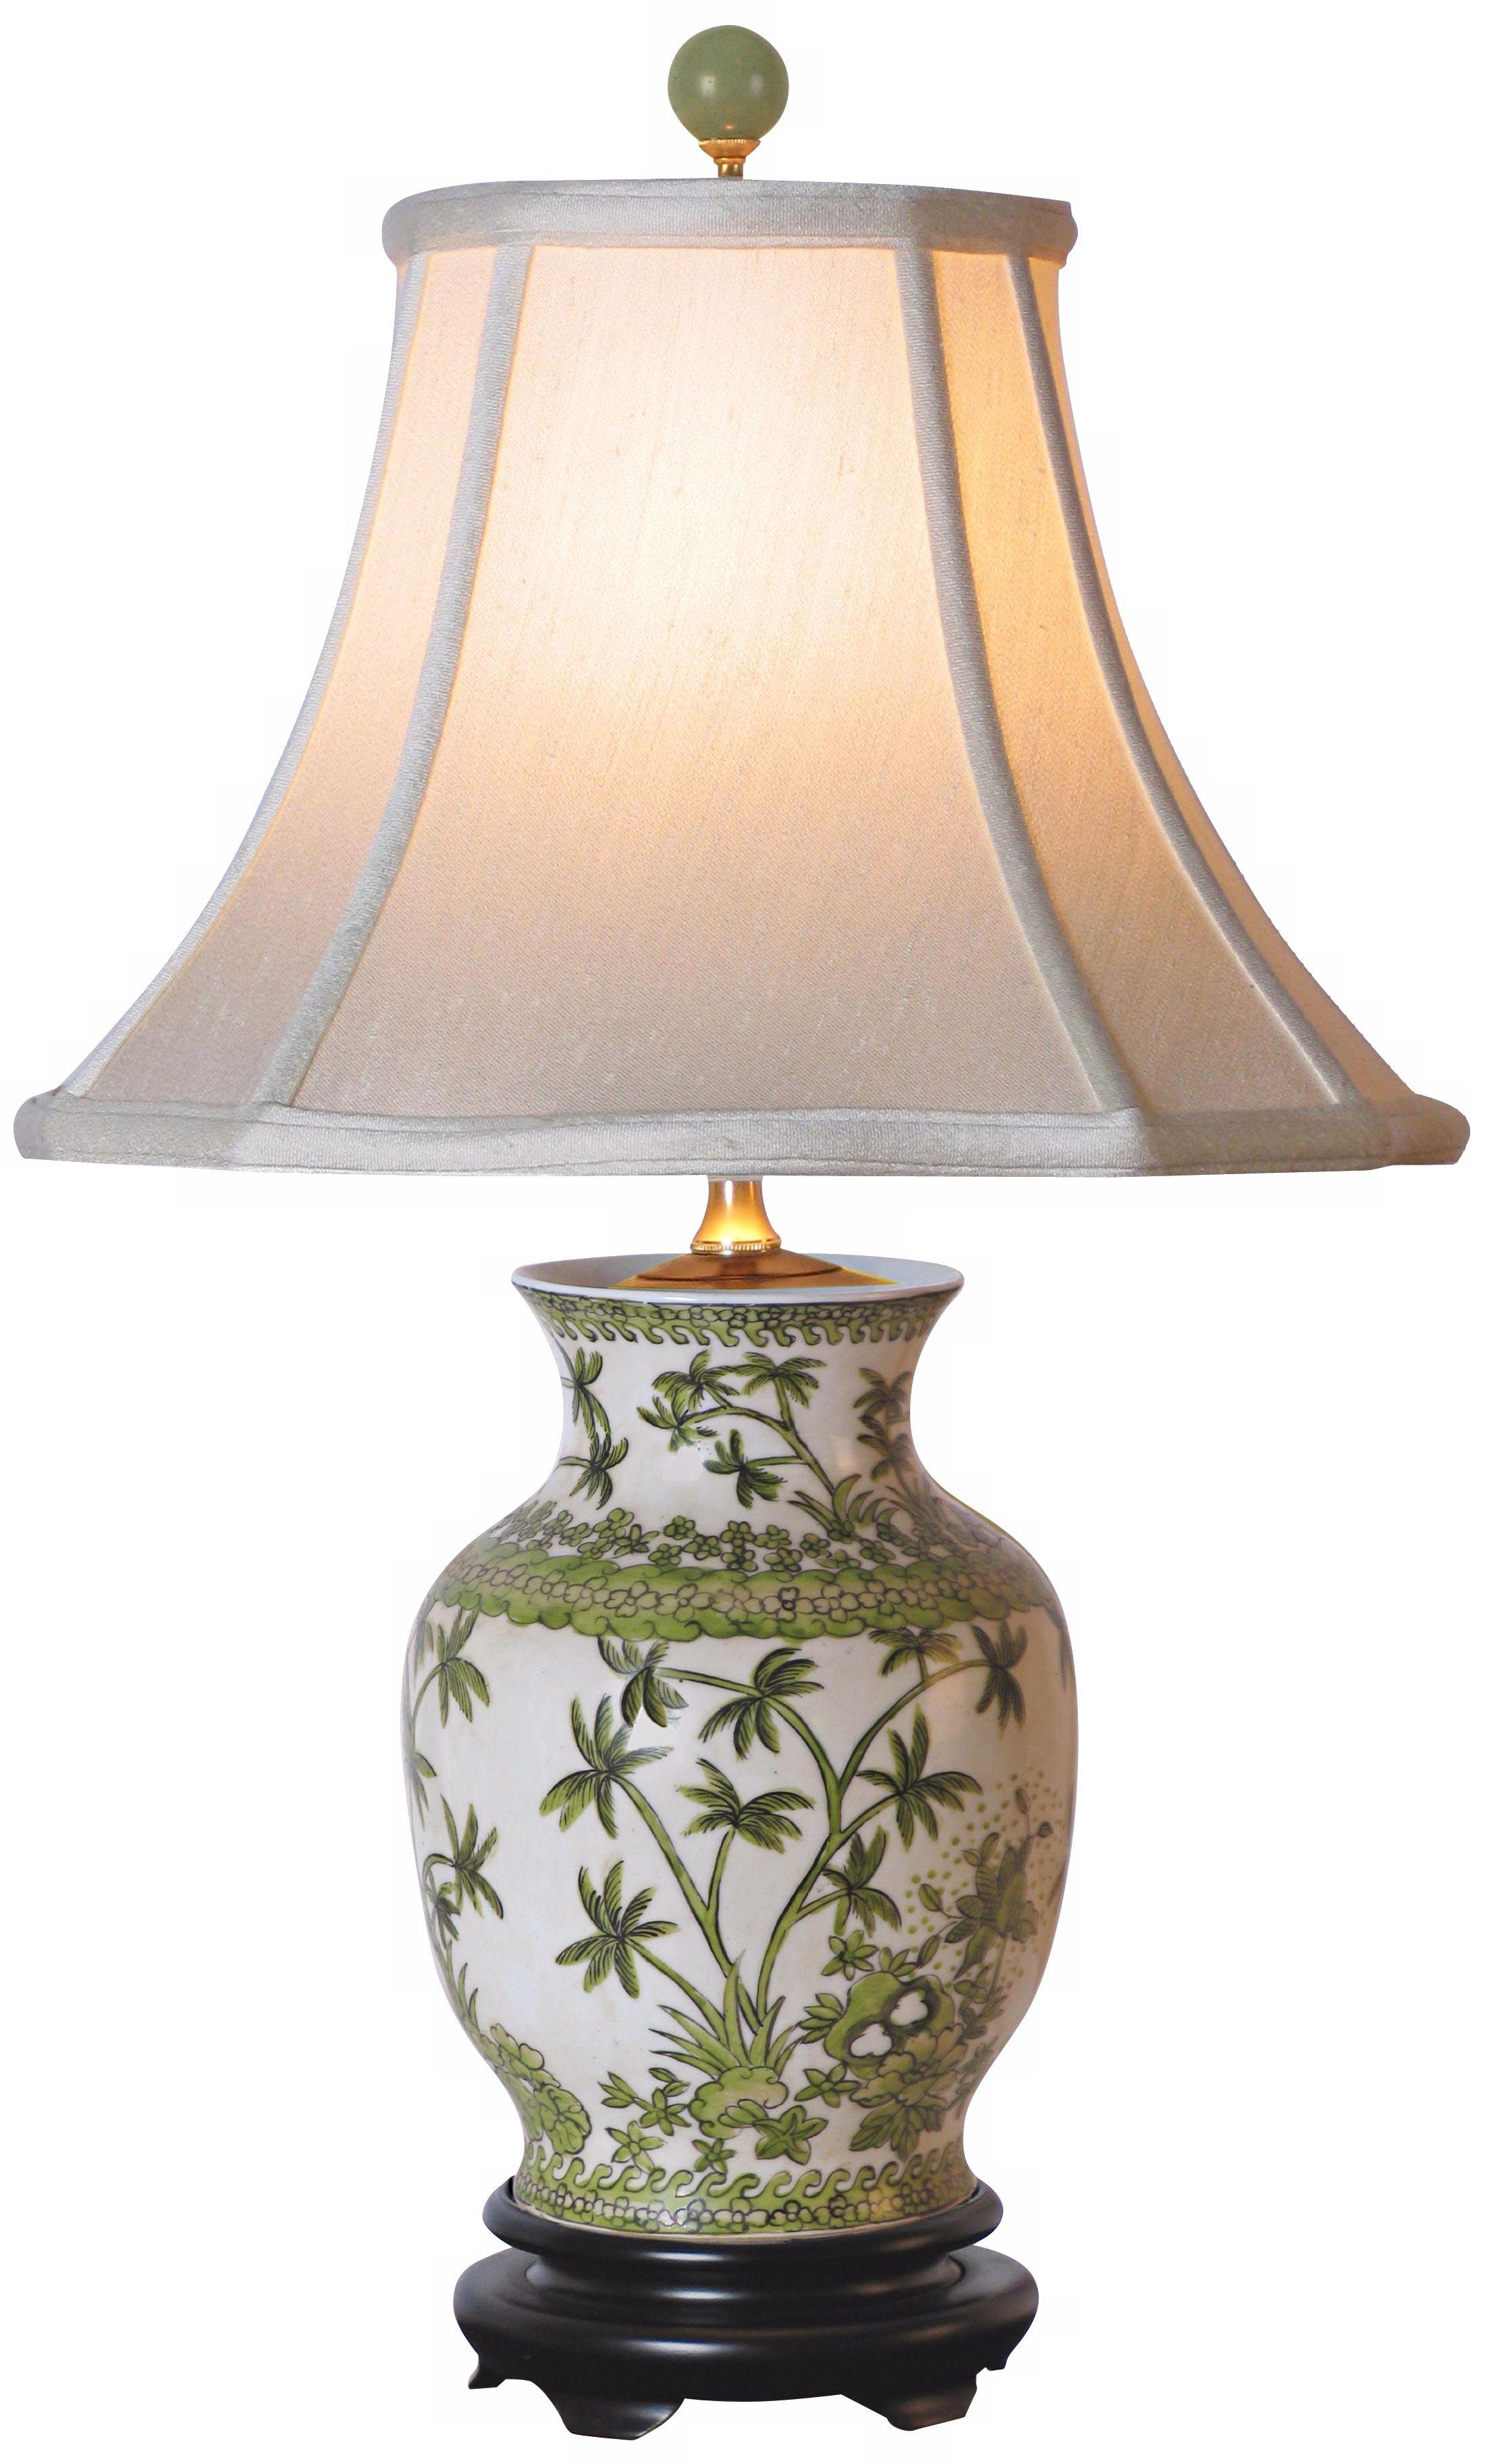 Superb Palm Tree Porcelain Vase Table Lamp